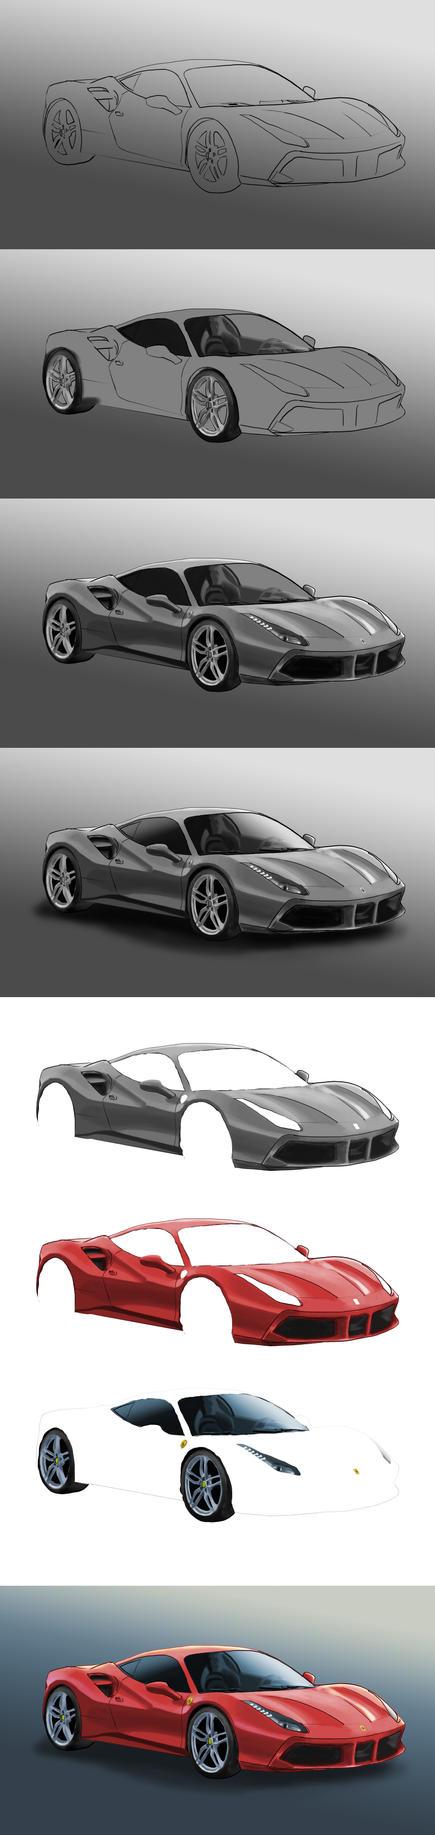 Ferrari 488 Colour Process by TAMAKINGHINI